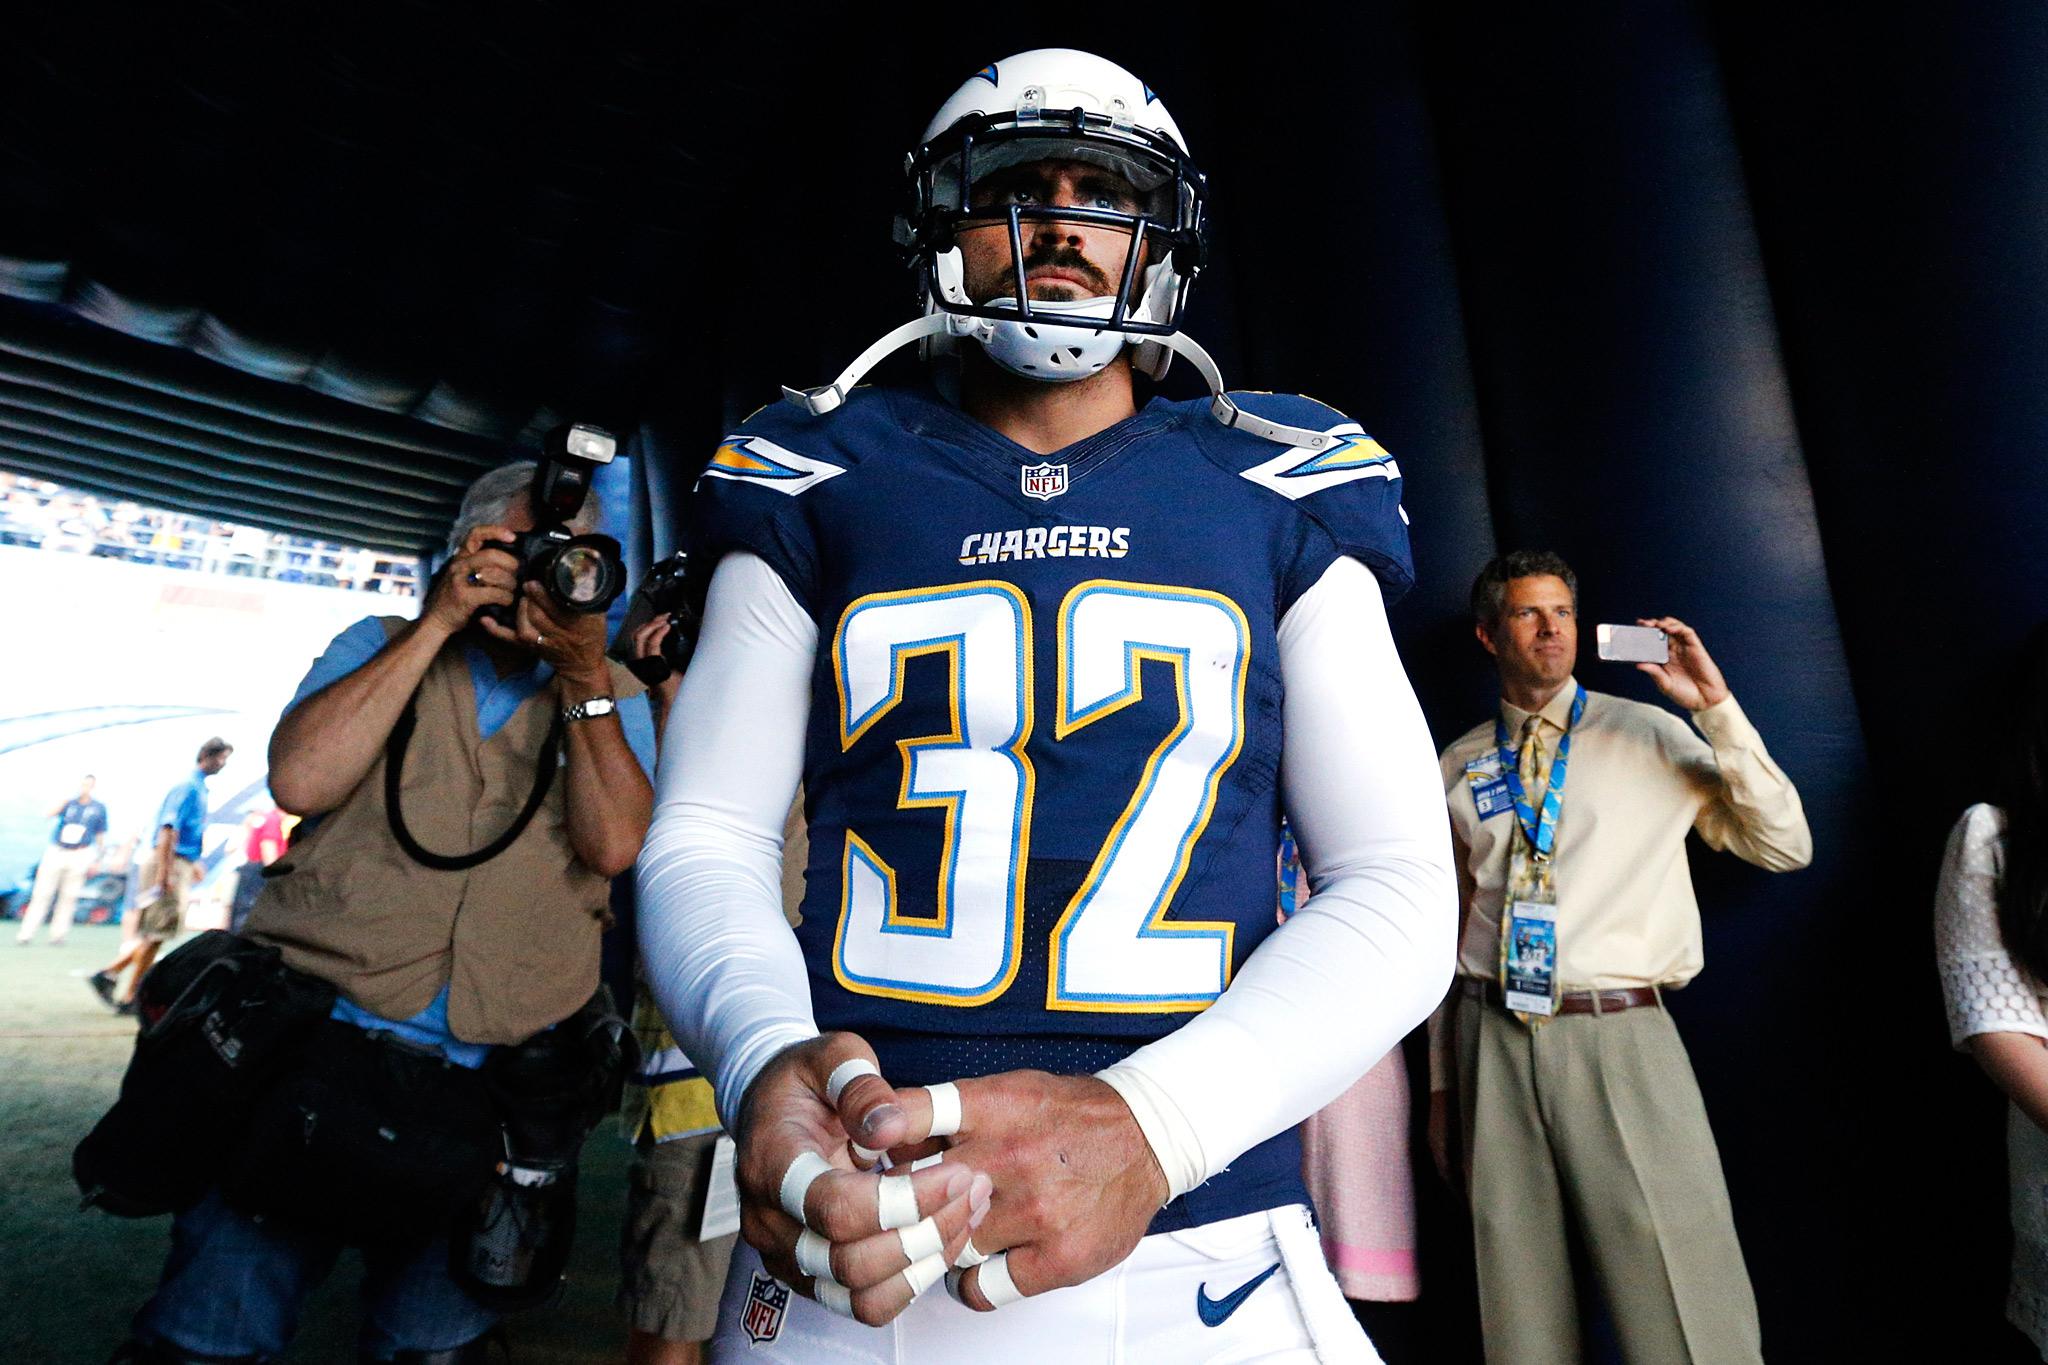 #NFLRank No. 24, Defense: Eric Weddle